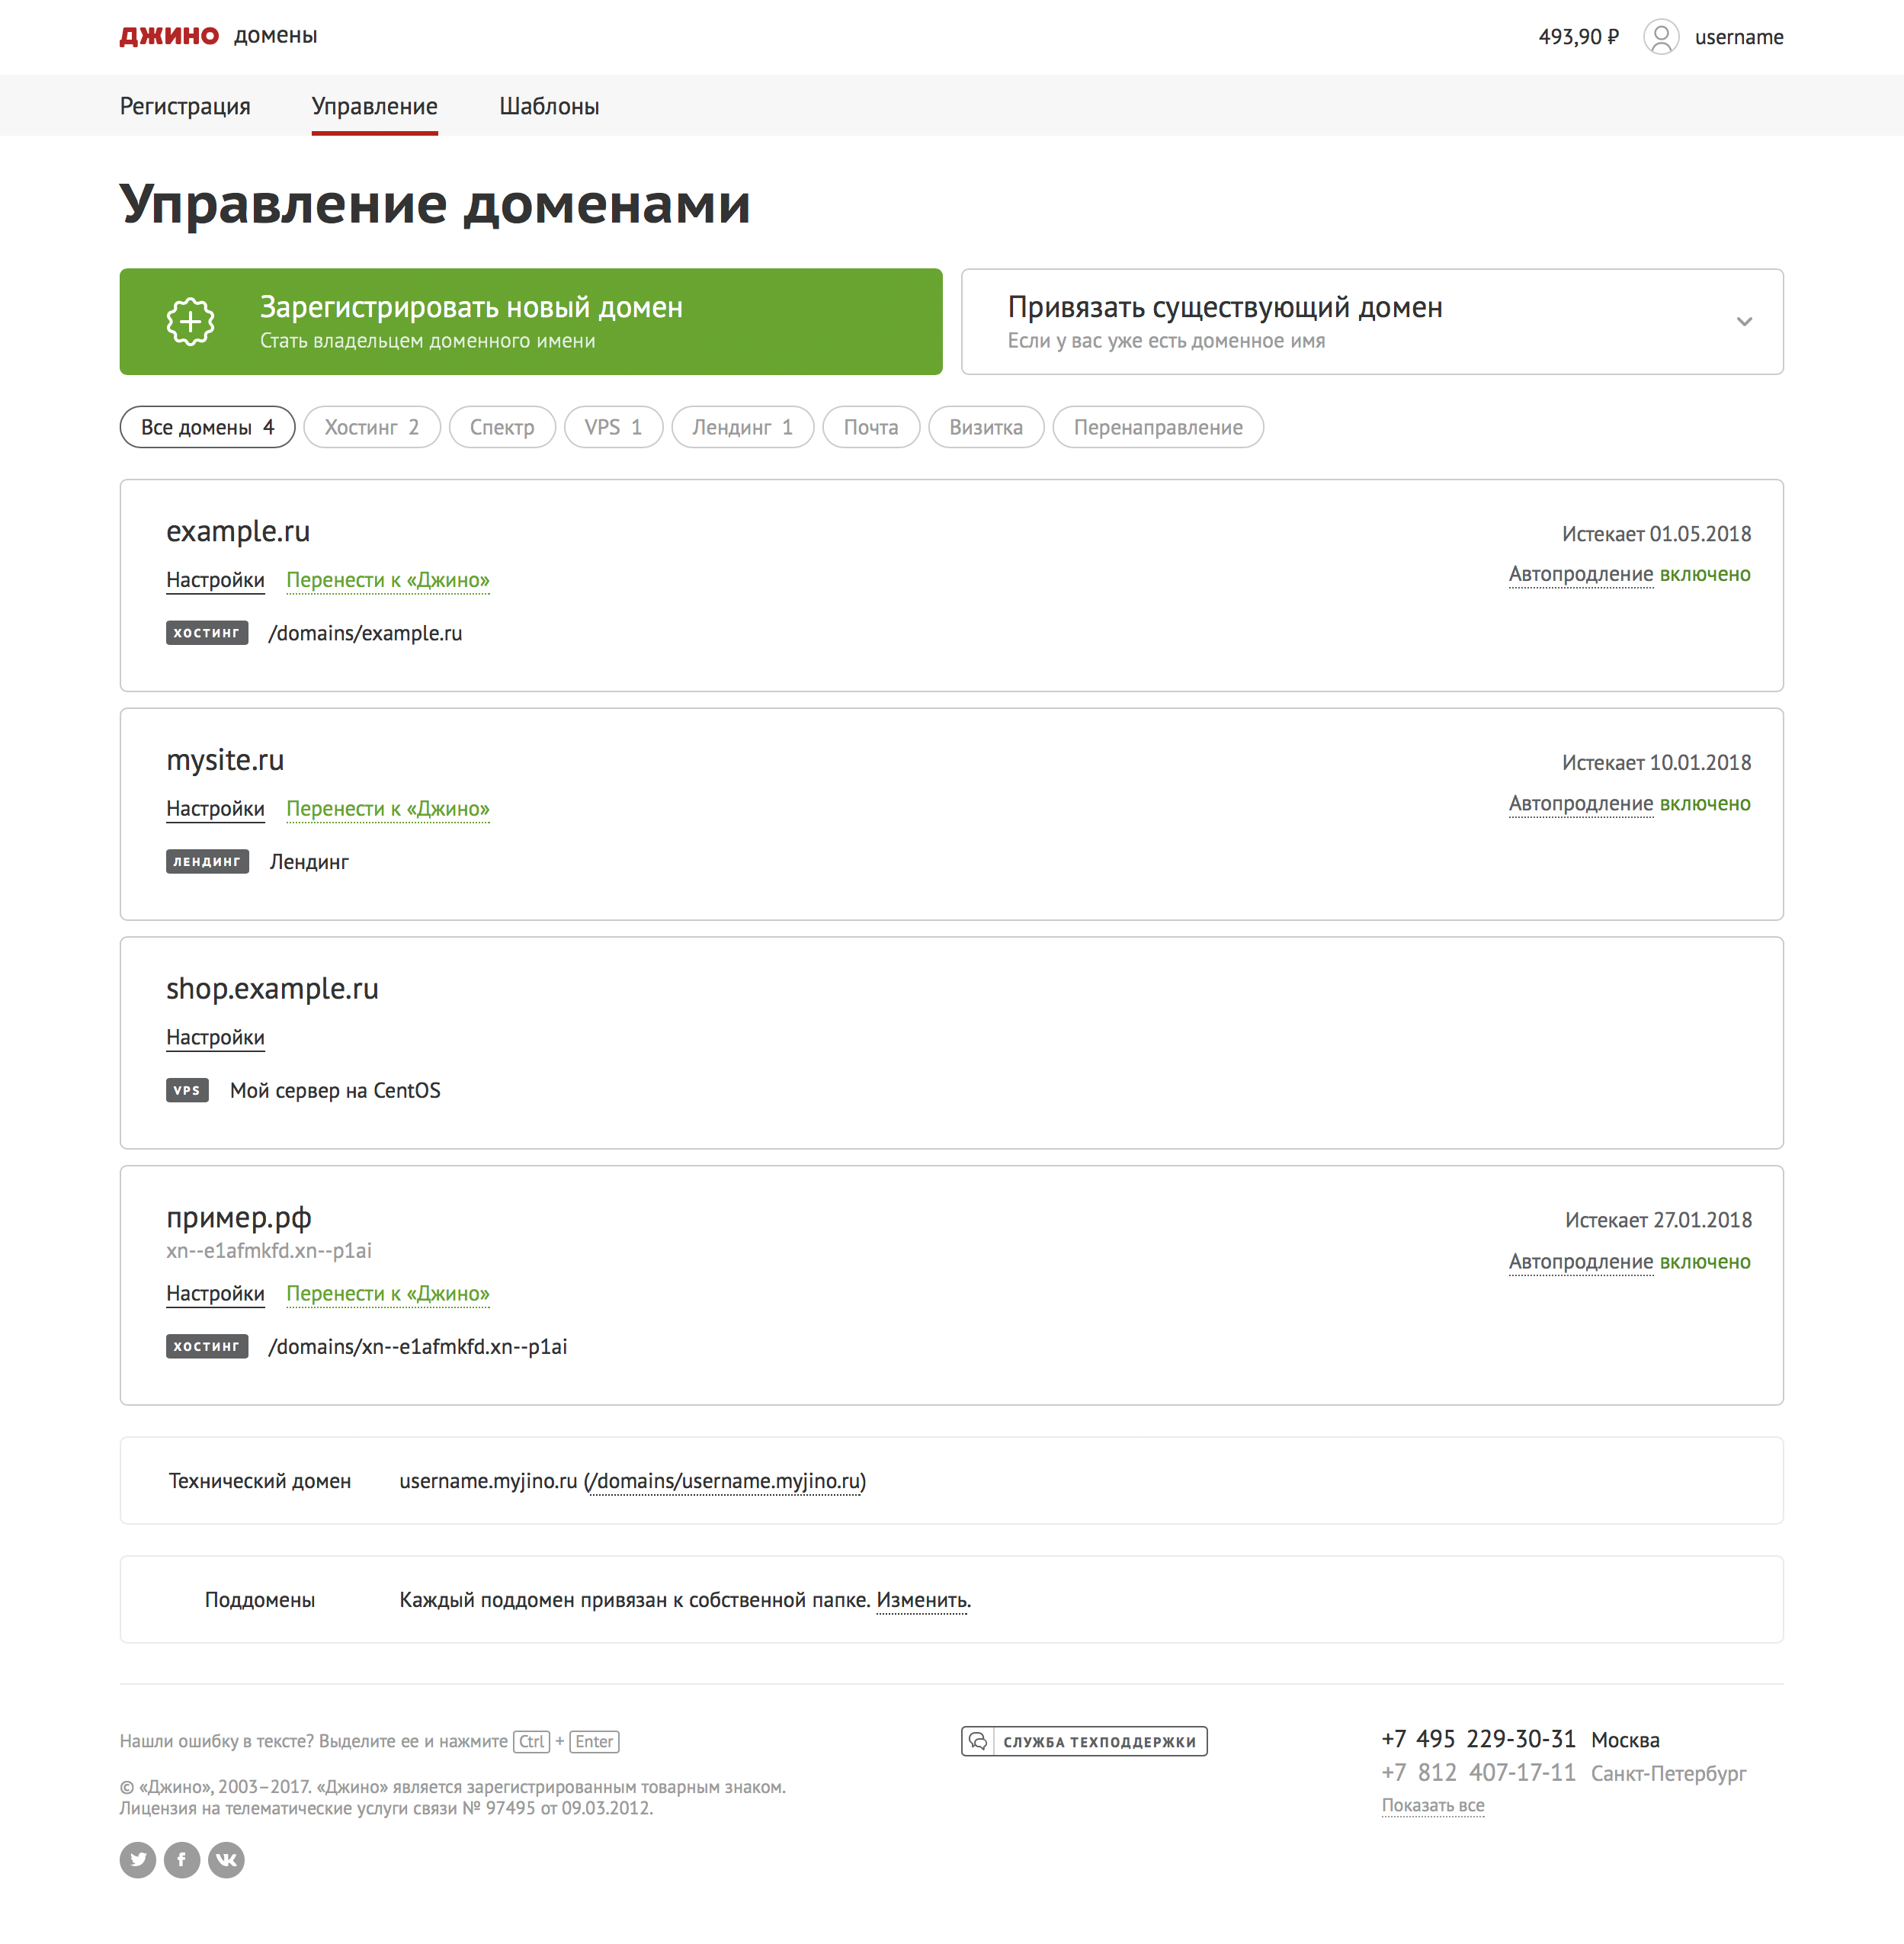 linux настройка хостинг сервера